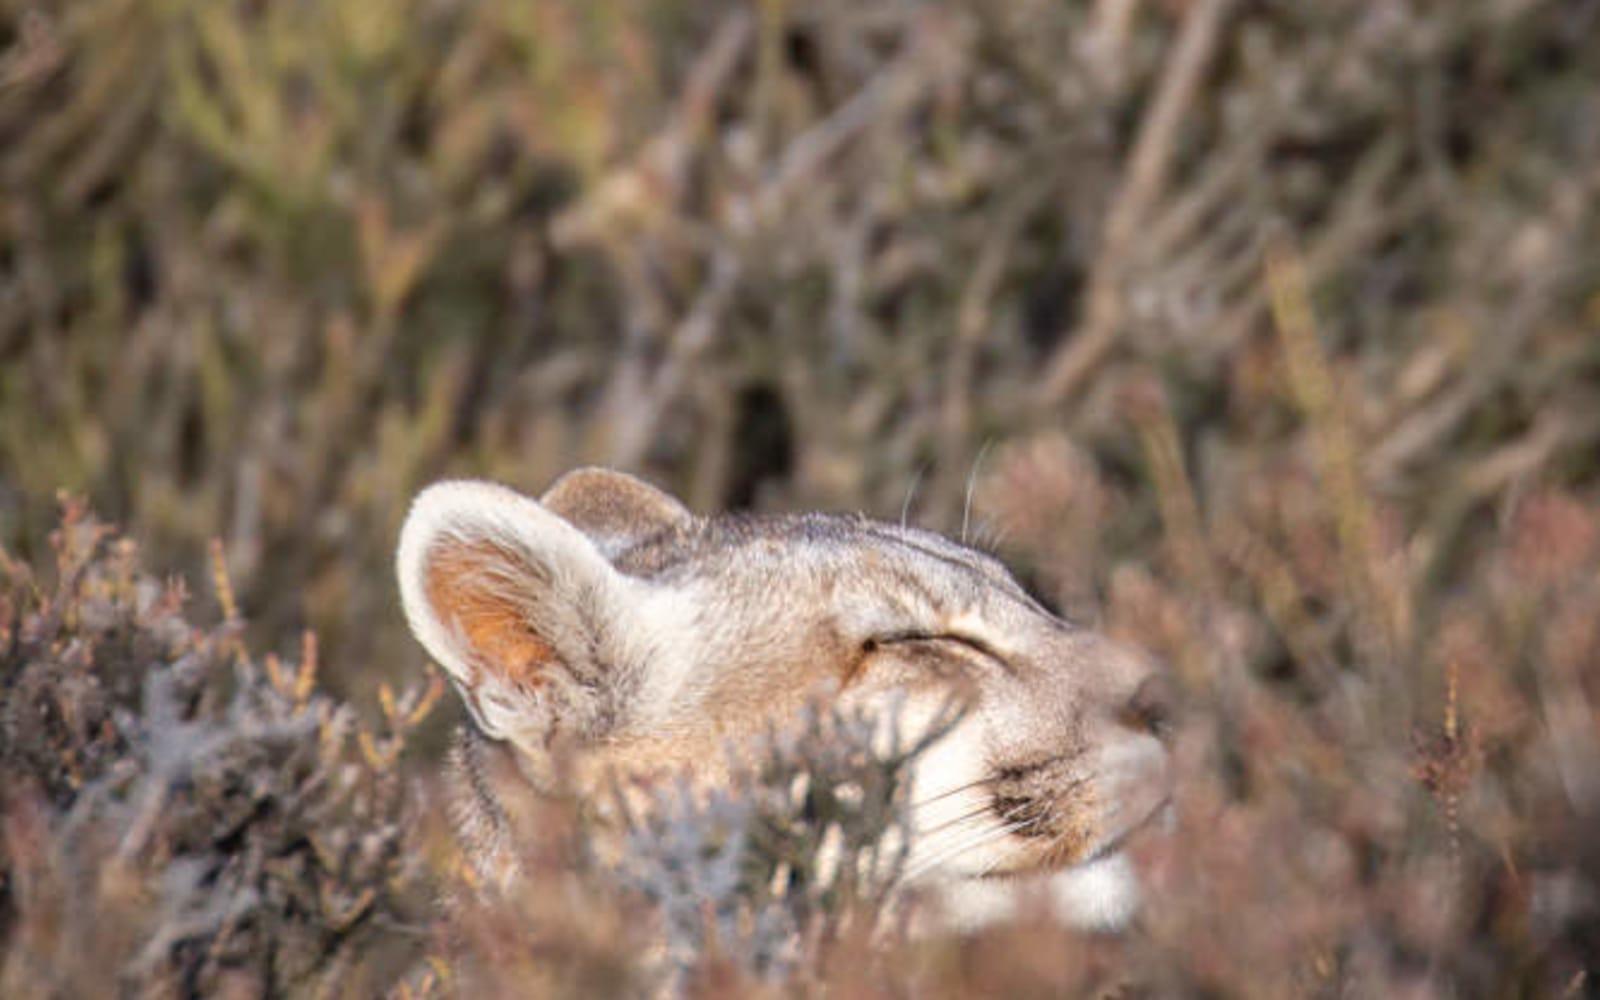 >Puma Asleep in the Bush